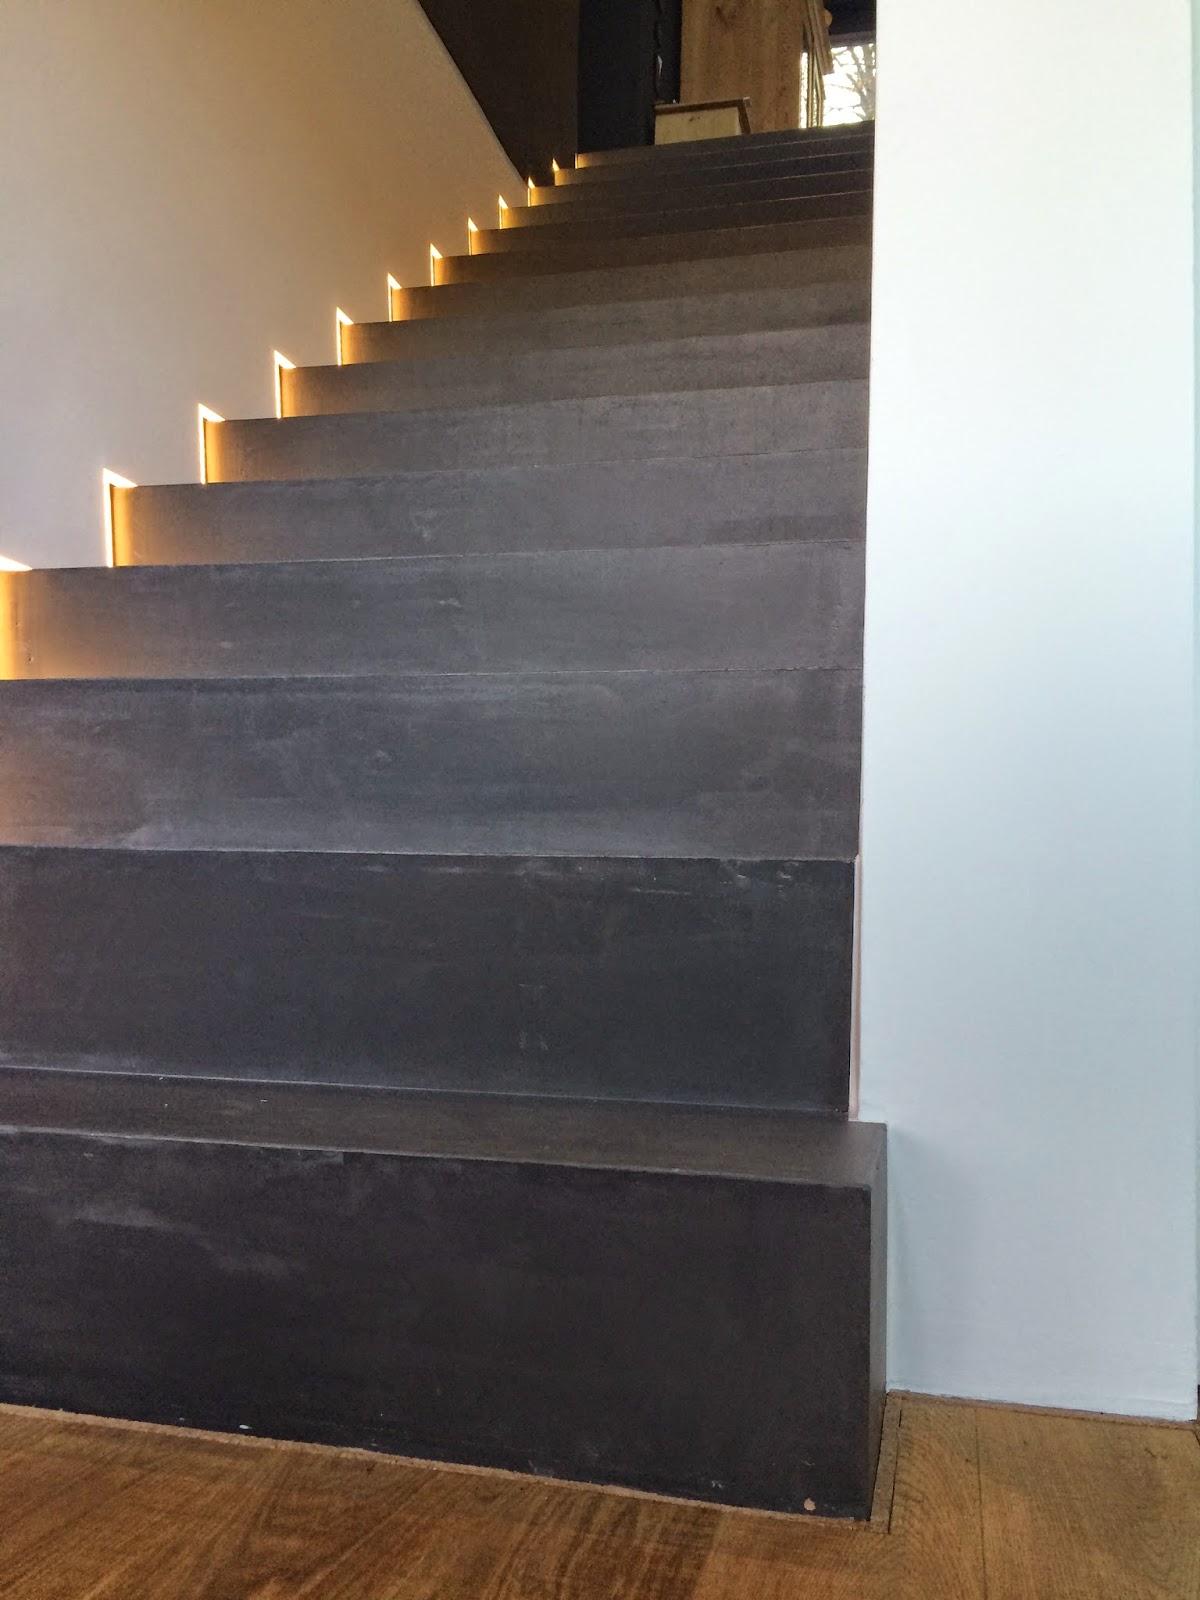 ehrf rchtige betontreppe verkleiden haus design ideen. Black Bedroom Furniture Sets. Home Design Ideas